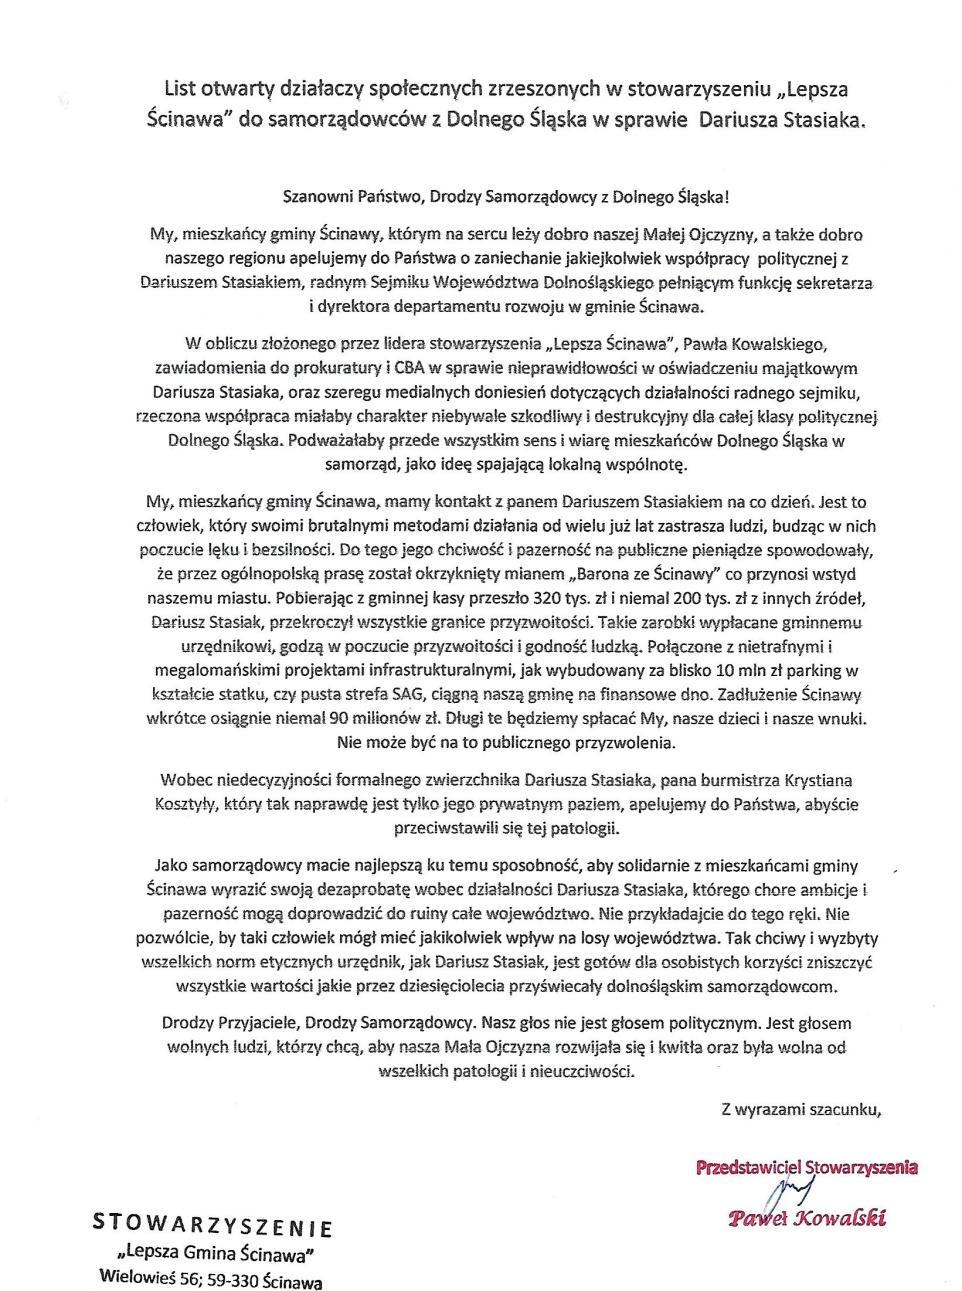 https://wroclawskiefakty.pl/wp-content/uploads/2021/03/APEL-DO-SAM....jpg